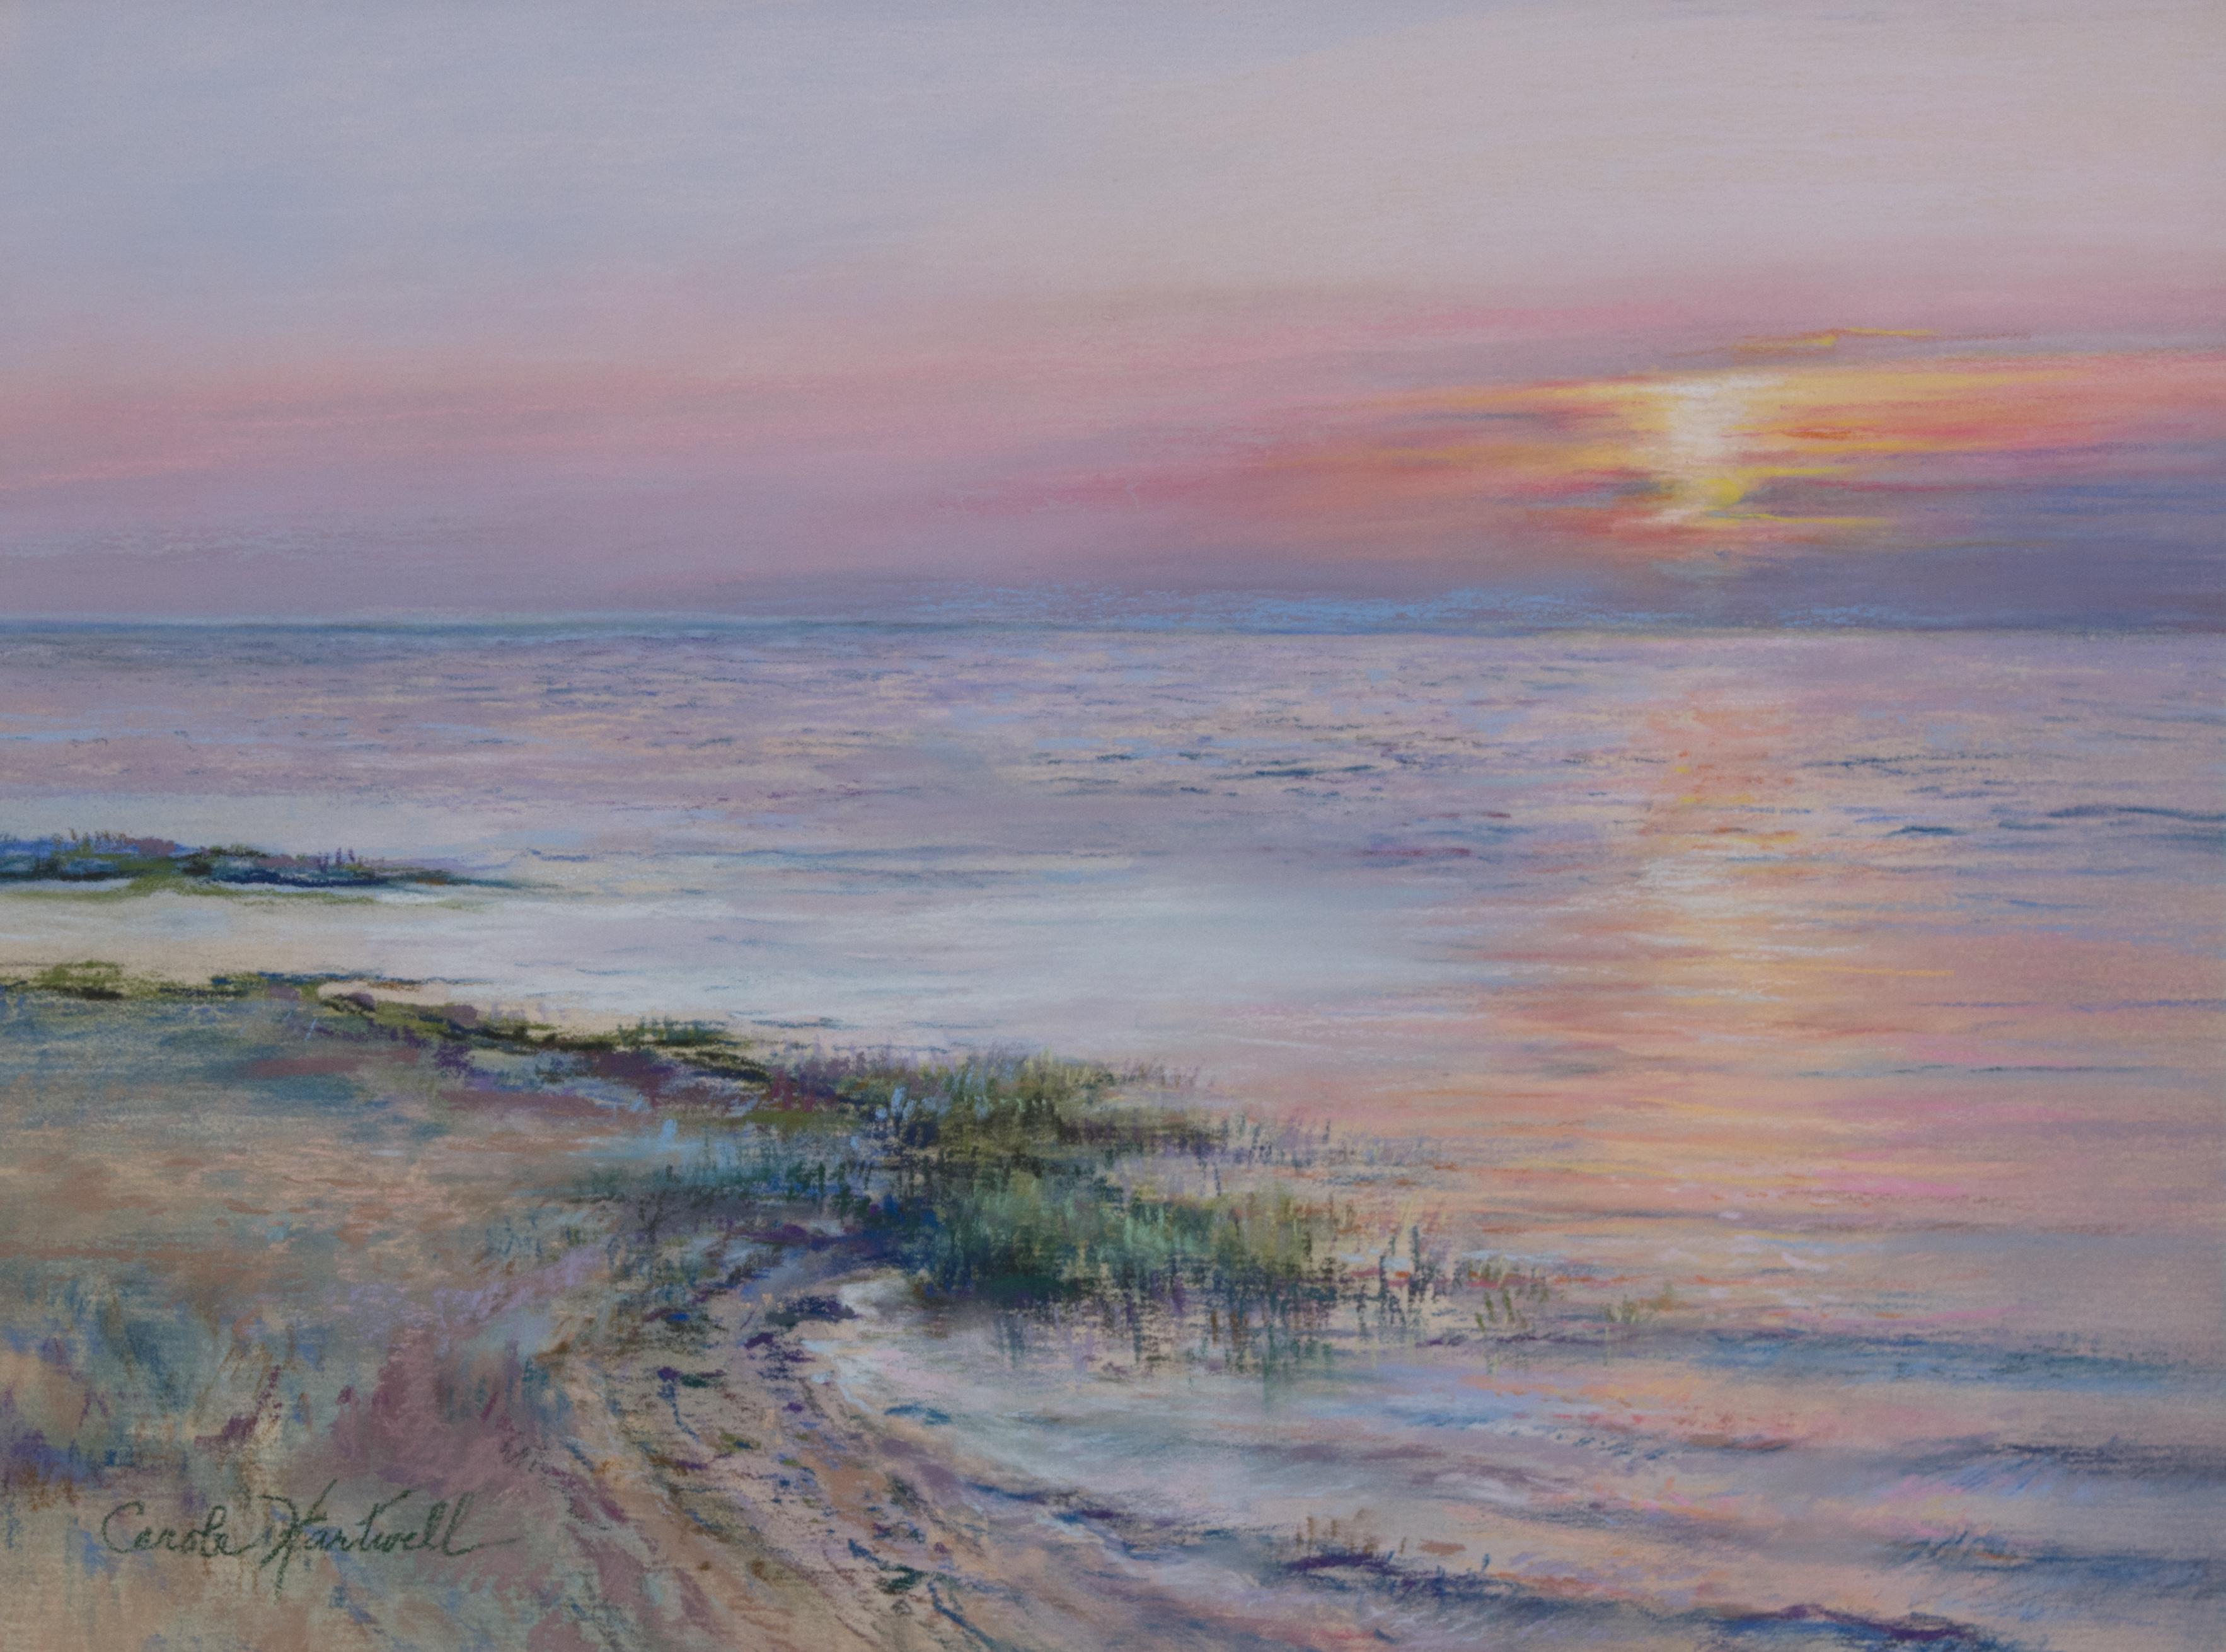 Carole Hartwell